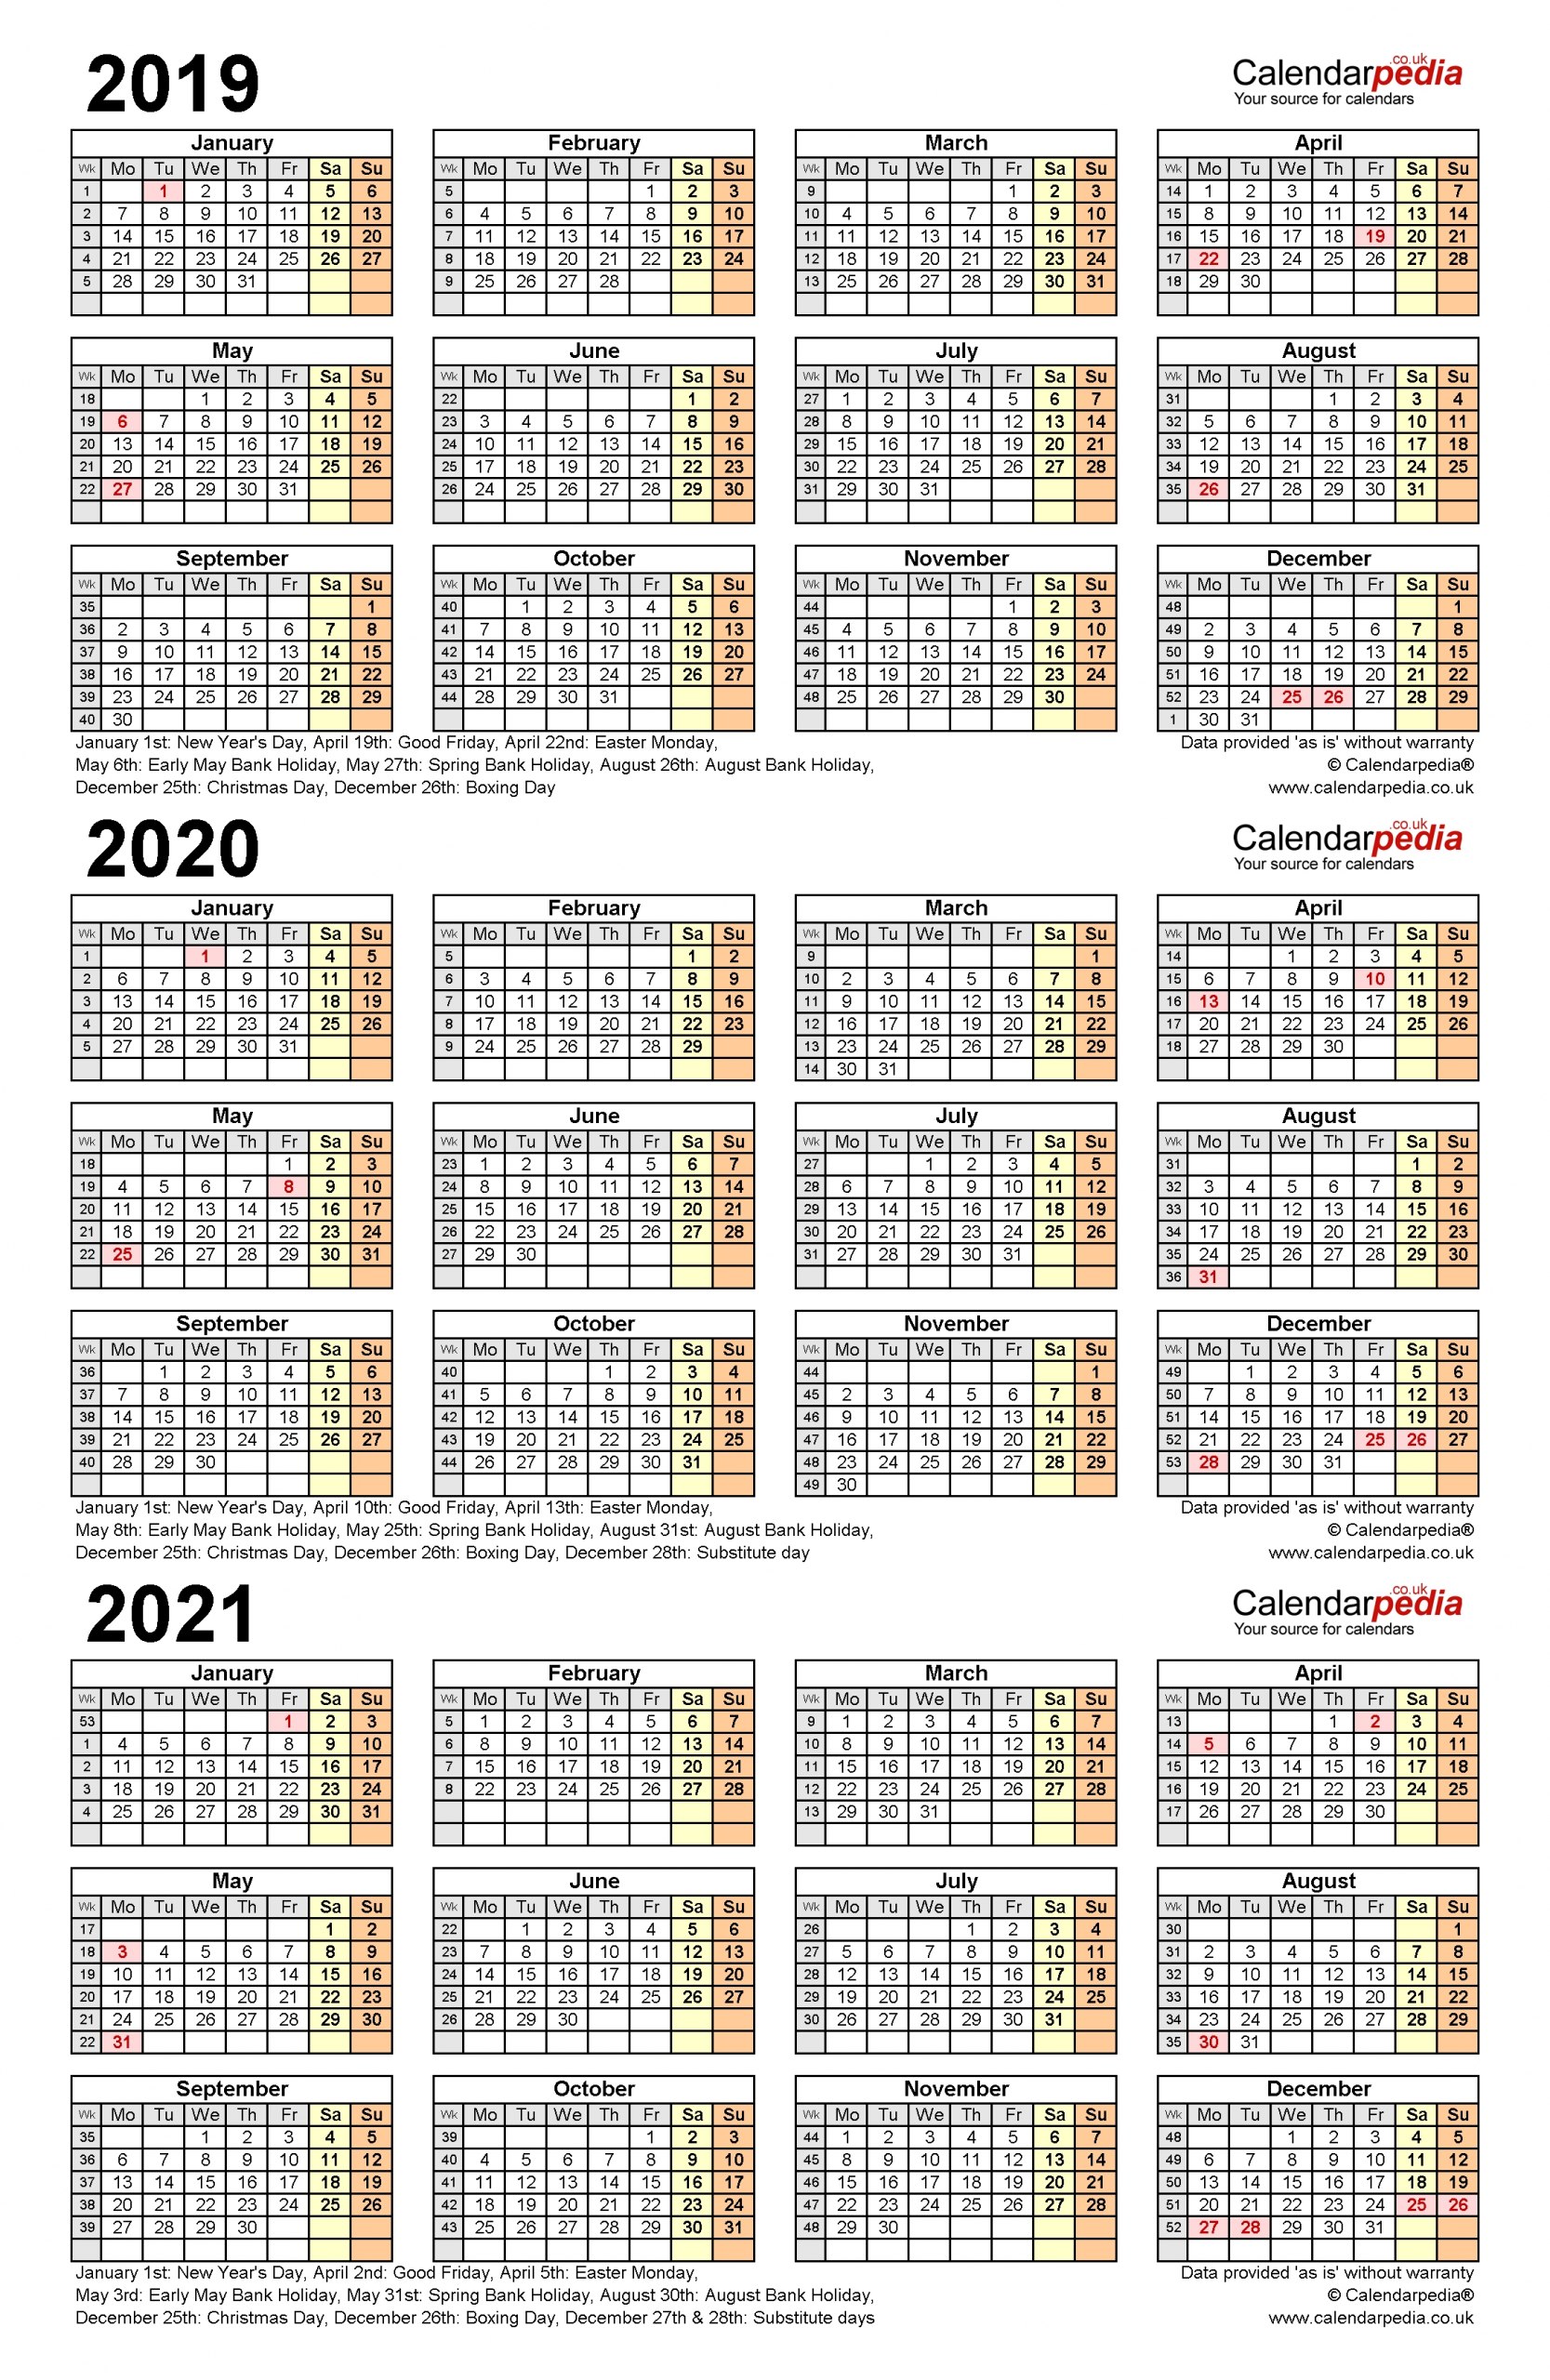 Three Year Calendars For 2019, 2020 & 2021 (Uk) For Pdf-3 Year Calendar 2021